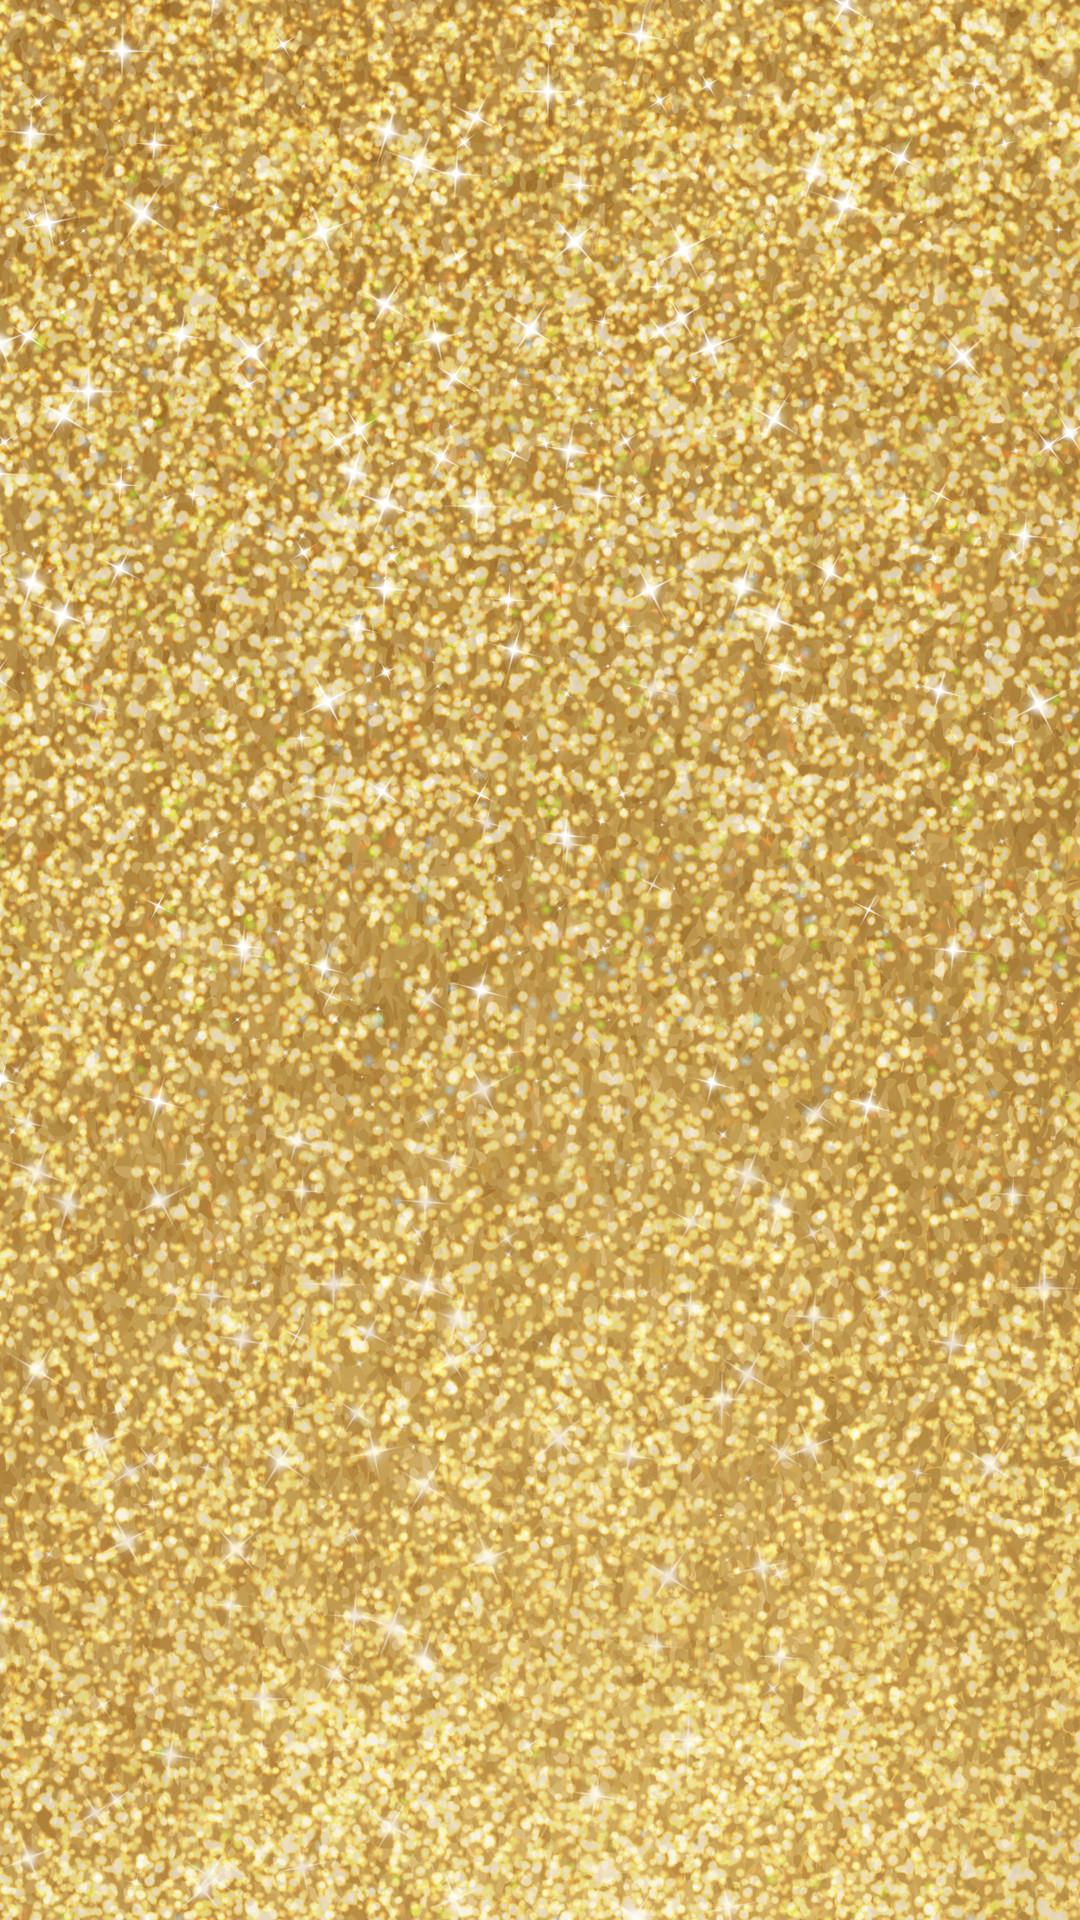 Gold glitter wallpaper 37 images - Wandfarbe gold glitter ...